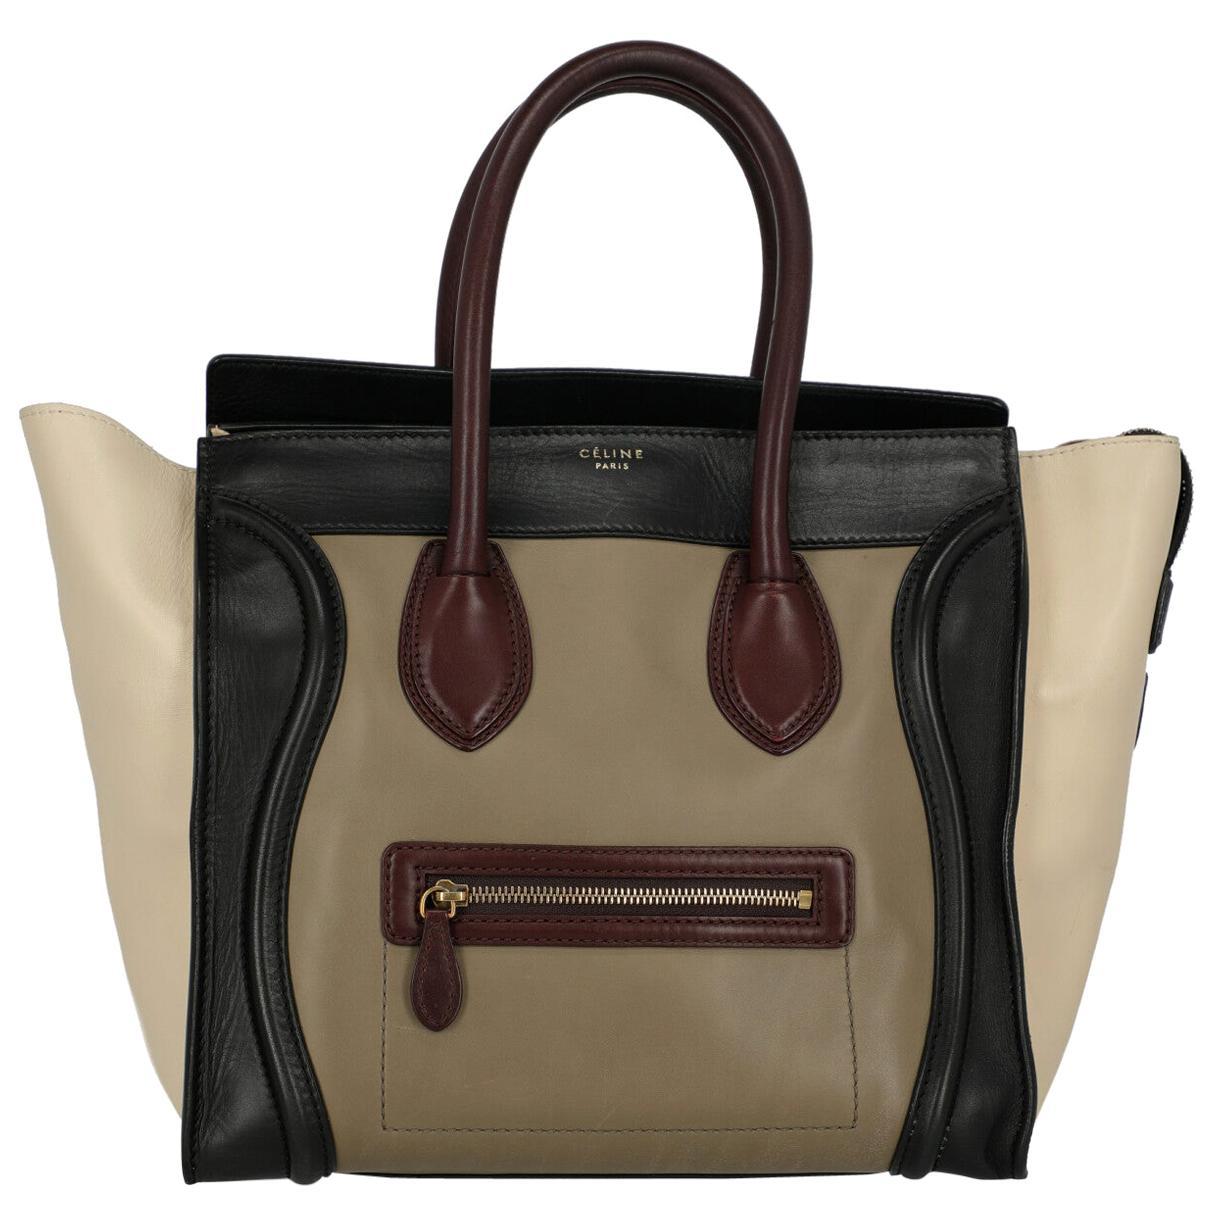 Celine Women's Luggage Black/Burgundy/Ecru Leather